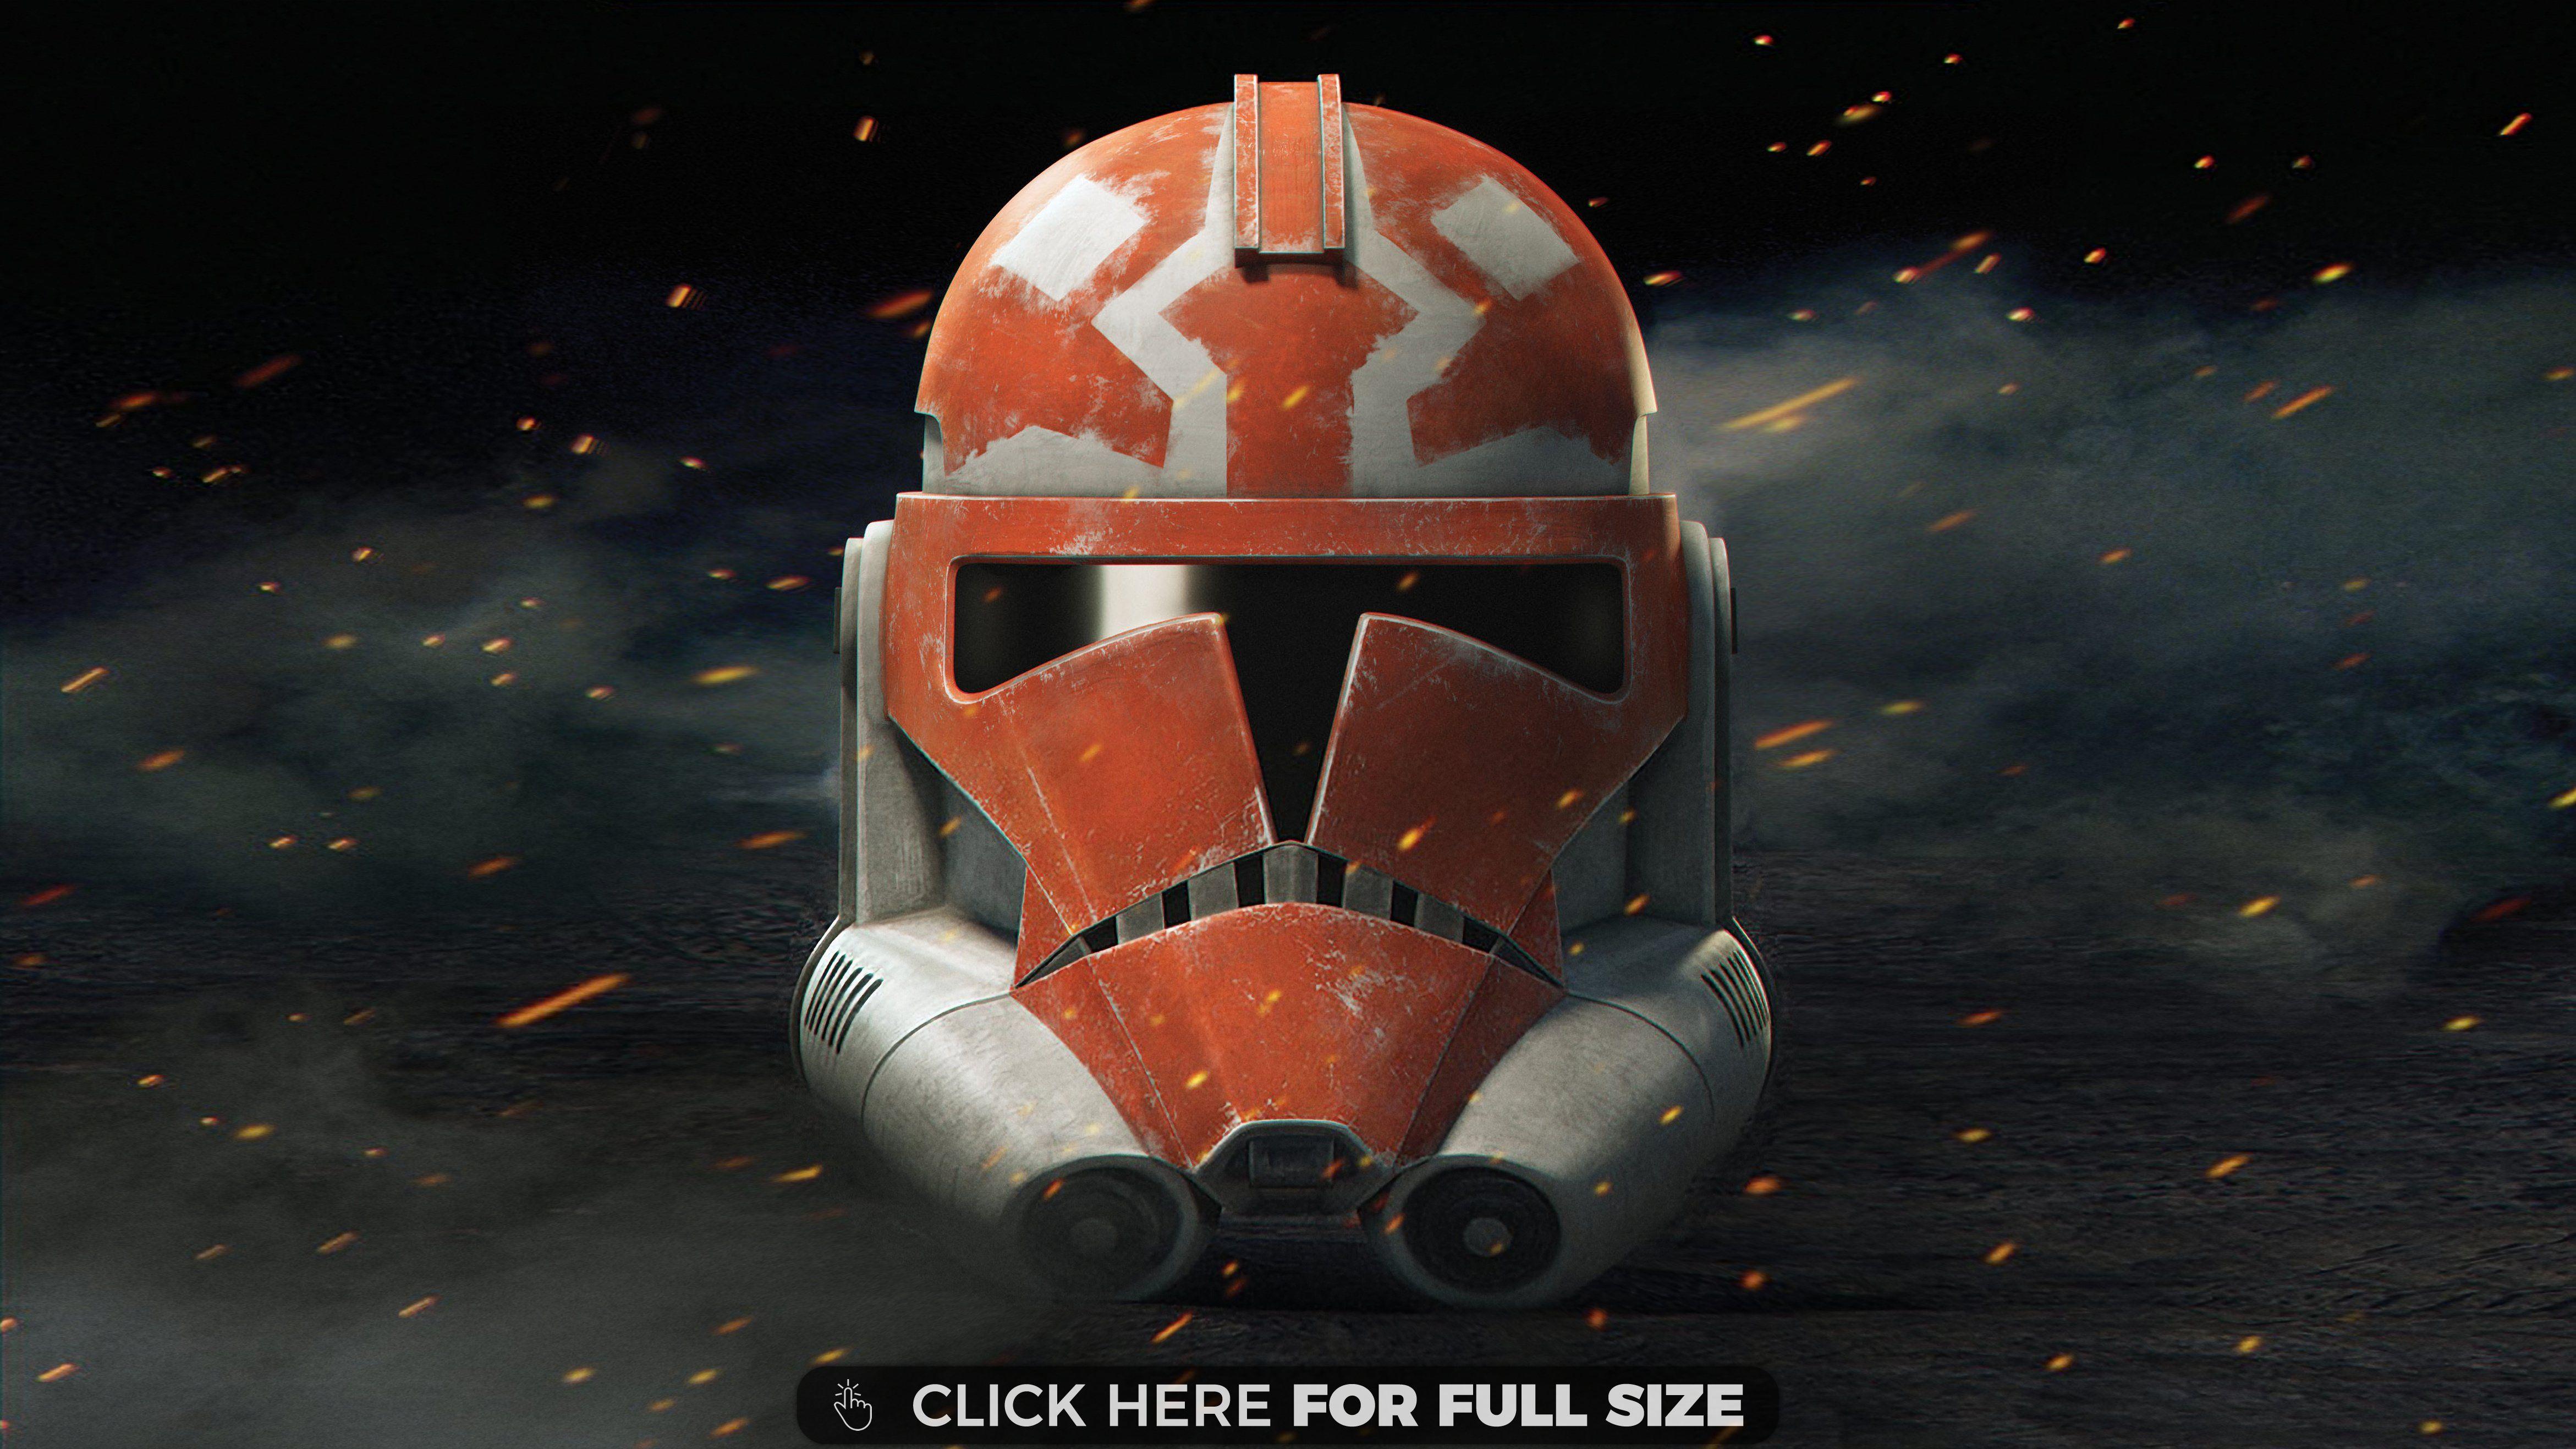 Star Wars The Clone Wars Season Clone Trooper Helmet 4k Wallpaper In 2020 Star Wars Art Star Wars Wallpaper Clone Trooper Helmet